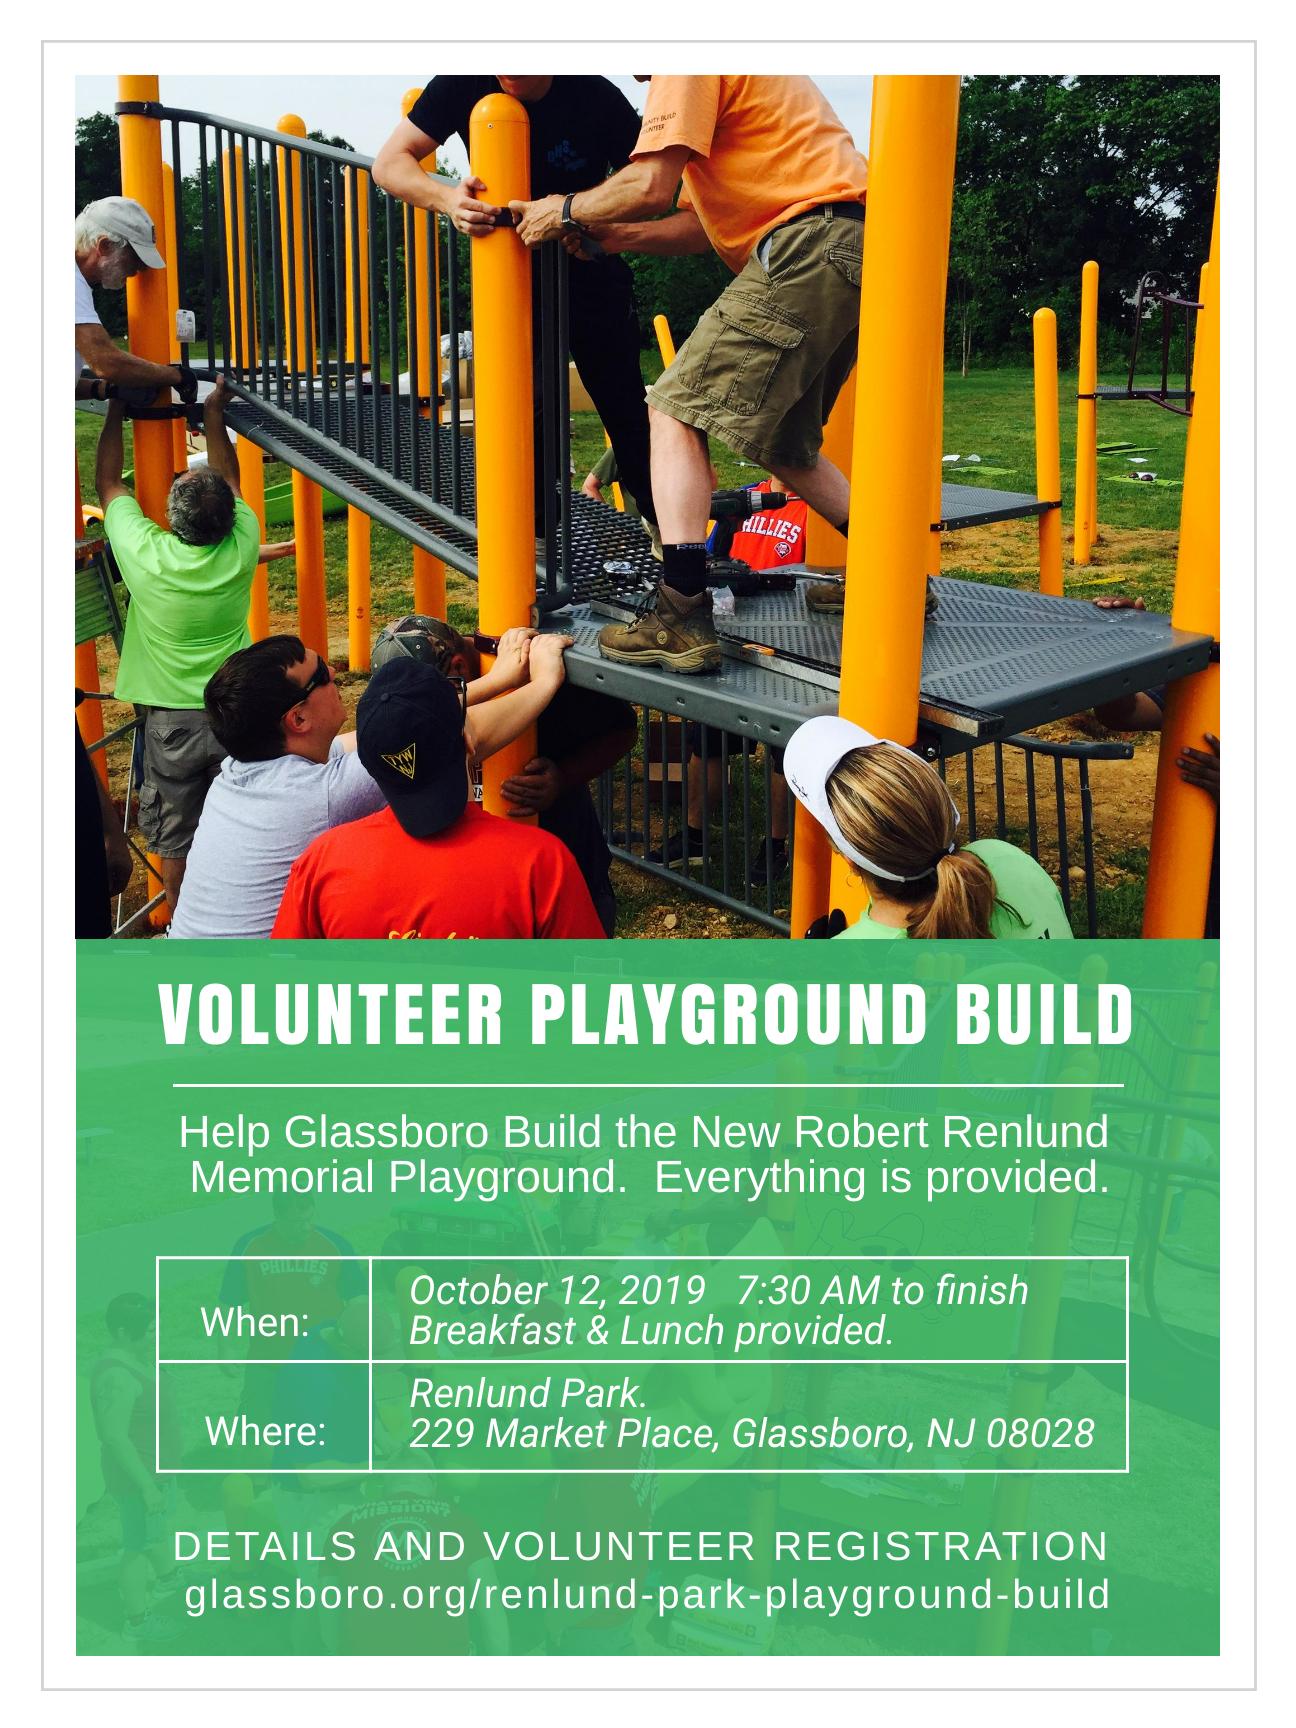 glassboro renlund park playground build.png